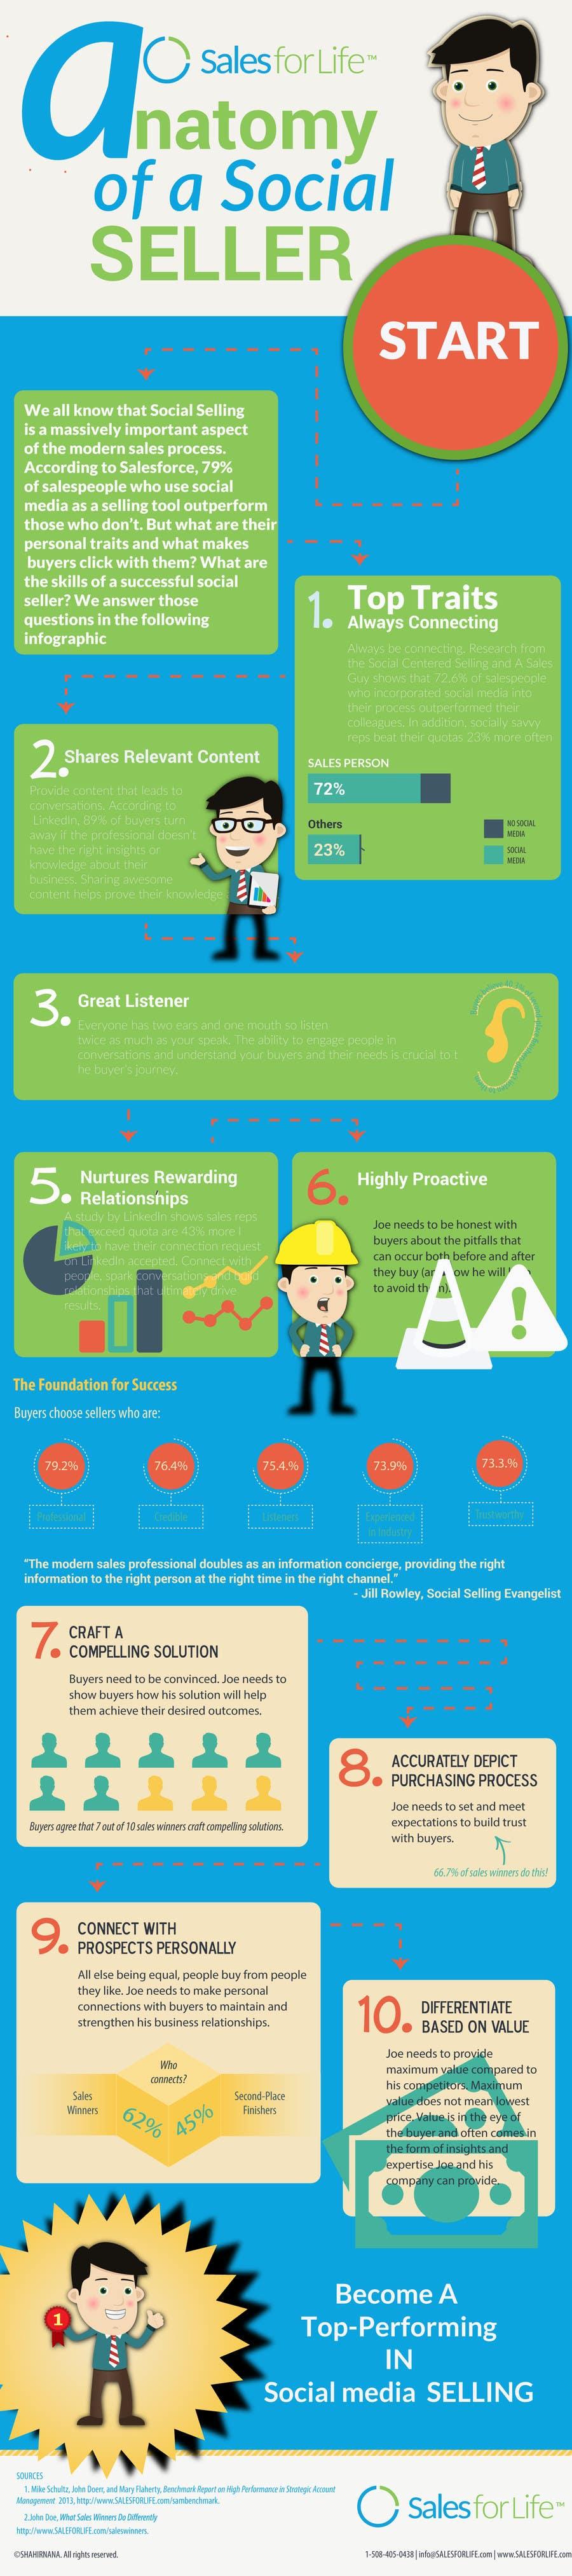 Konkurrenceindlæg #                                        8                                      for                                         Infographic about Social Selling Skills & Process: Flat Design